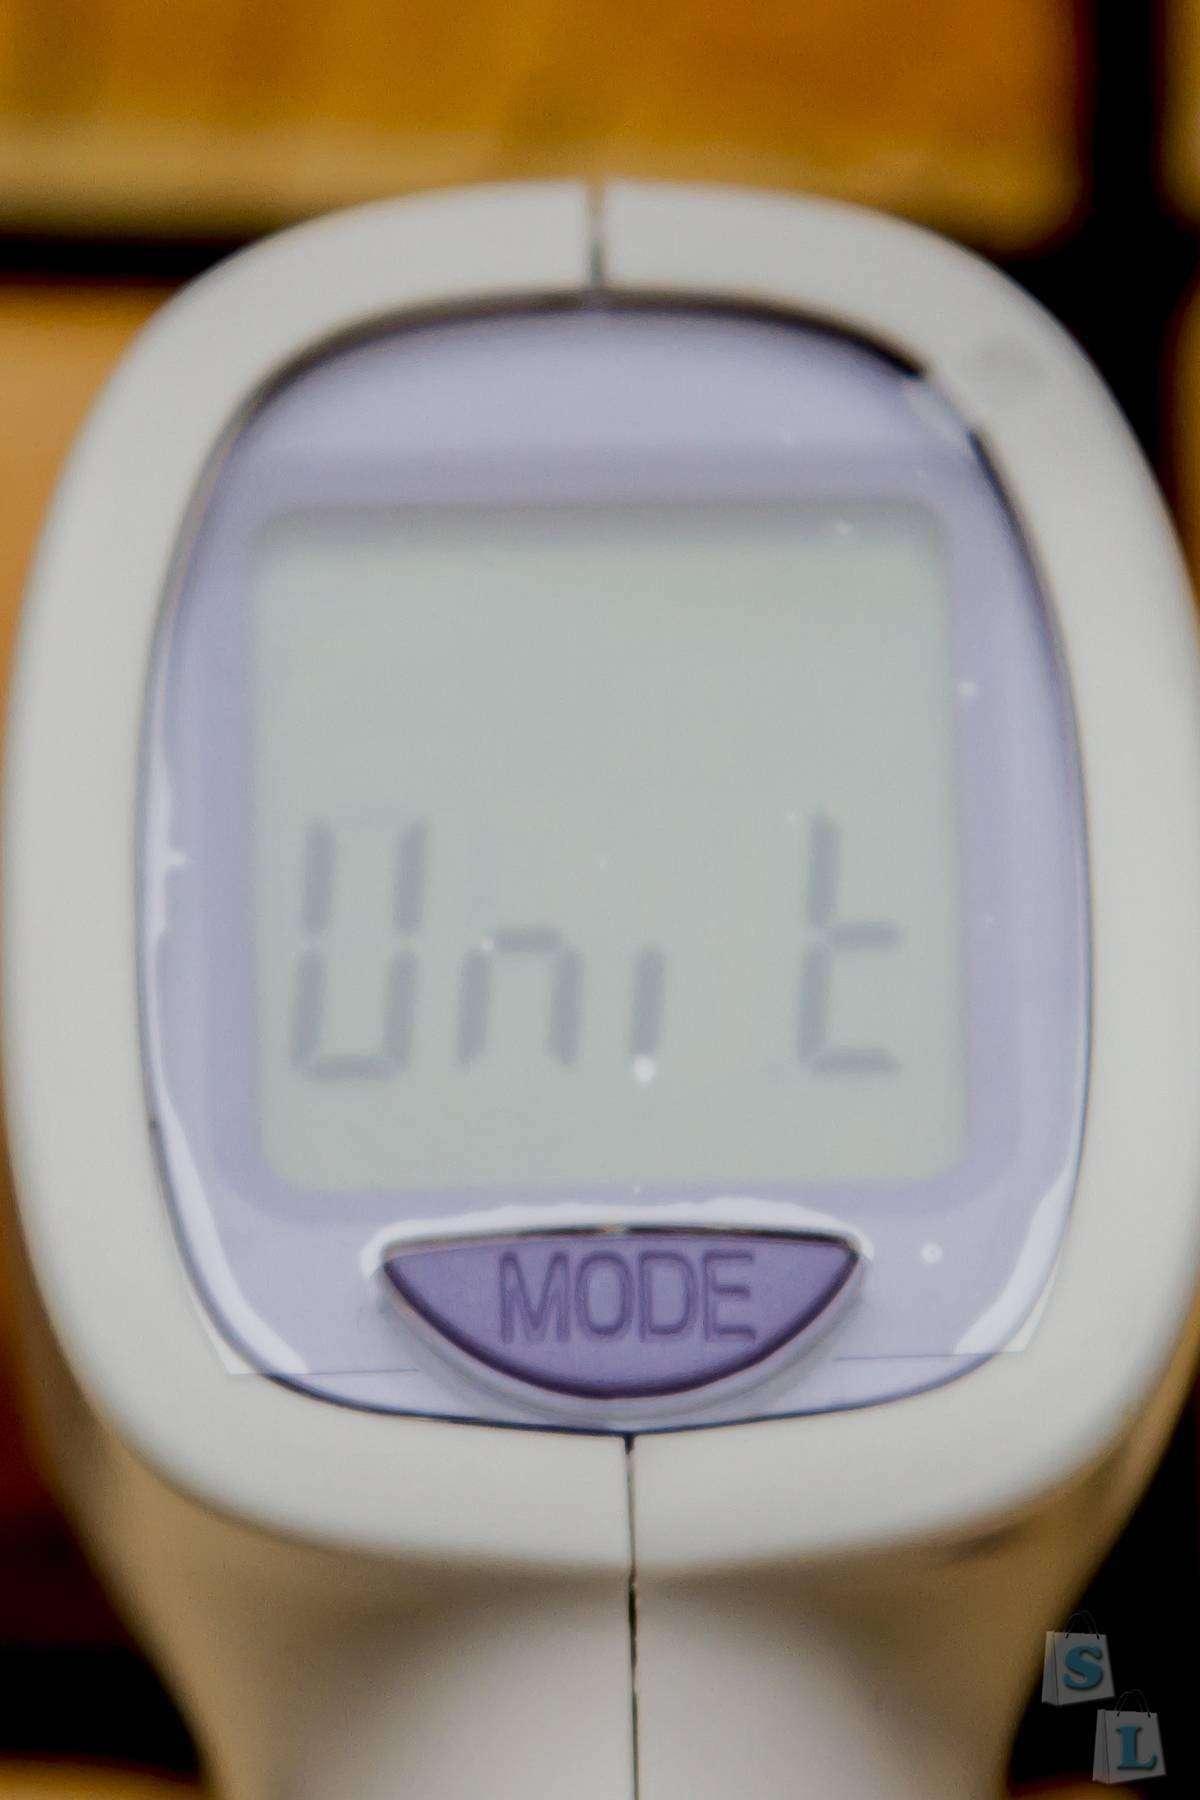 GearBest: Бесконтактный градусник TAISHENG HTD8808